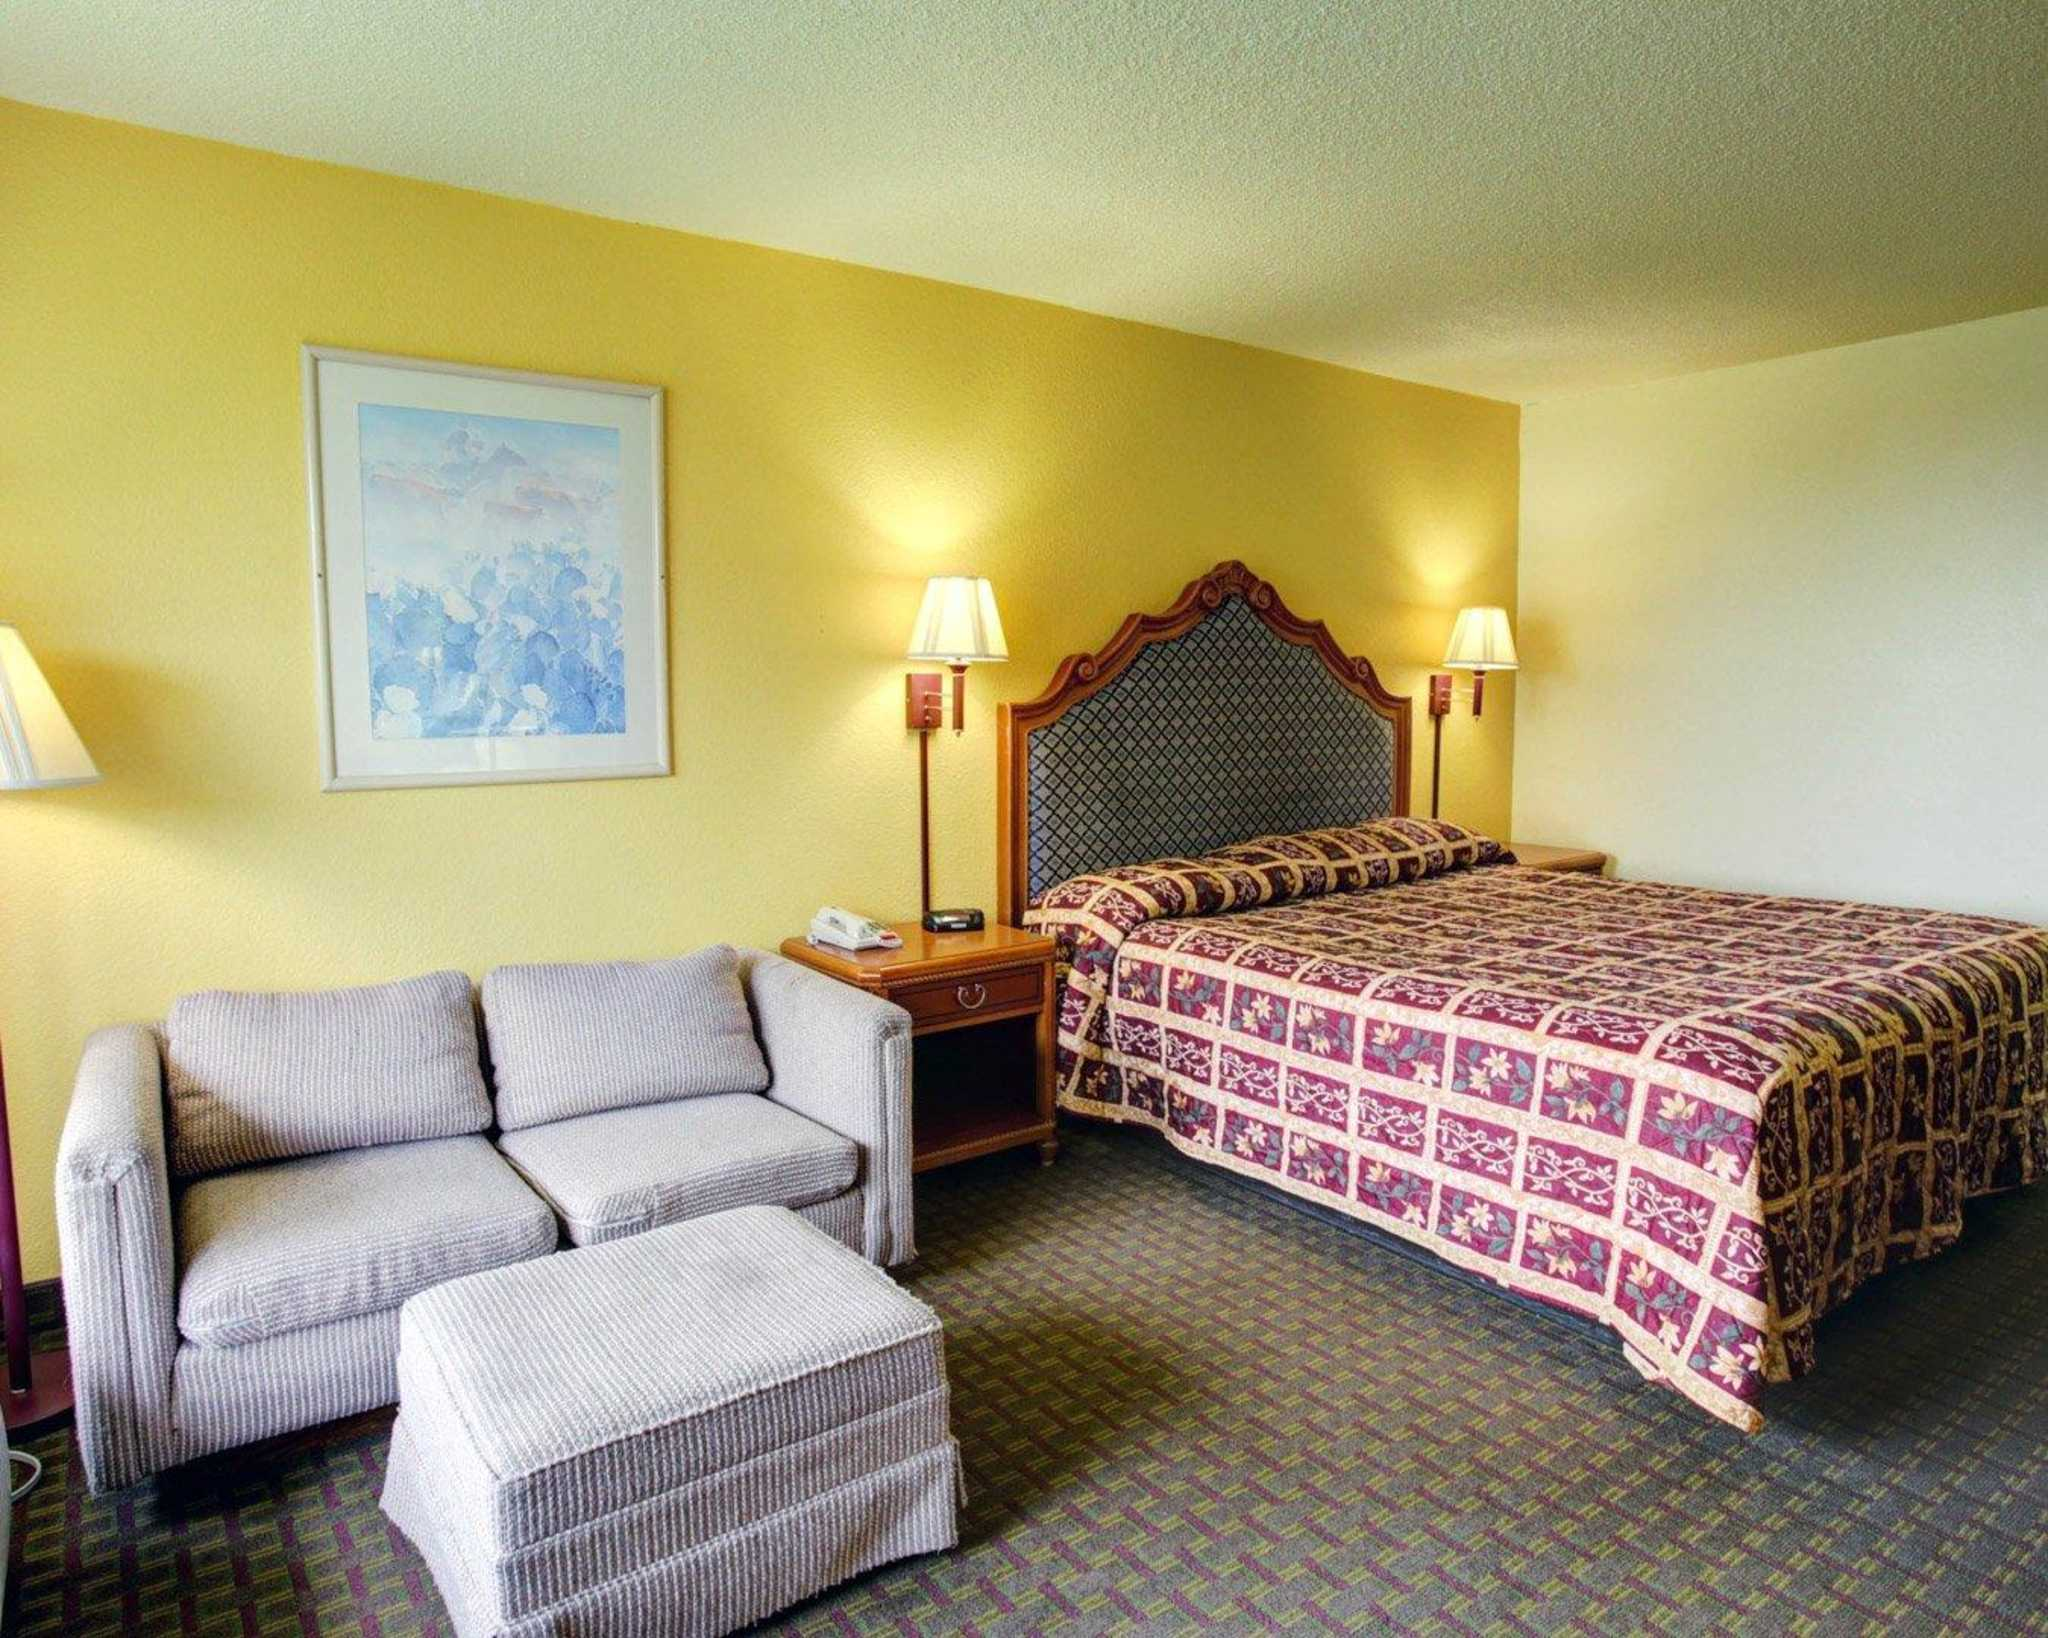 Rodeway Inn image 11